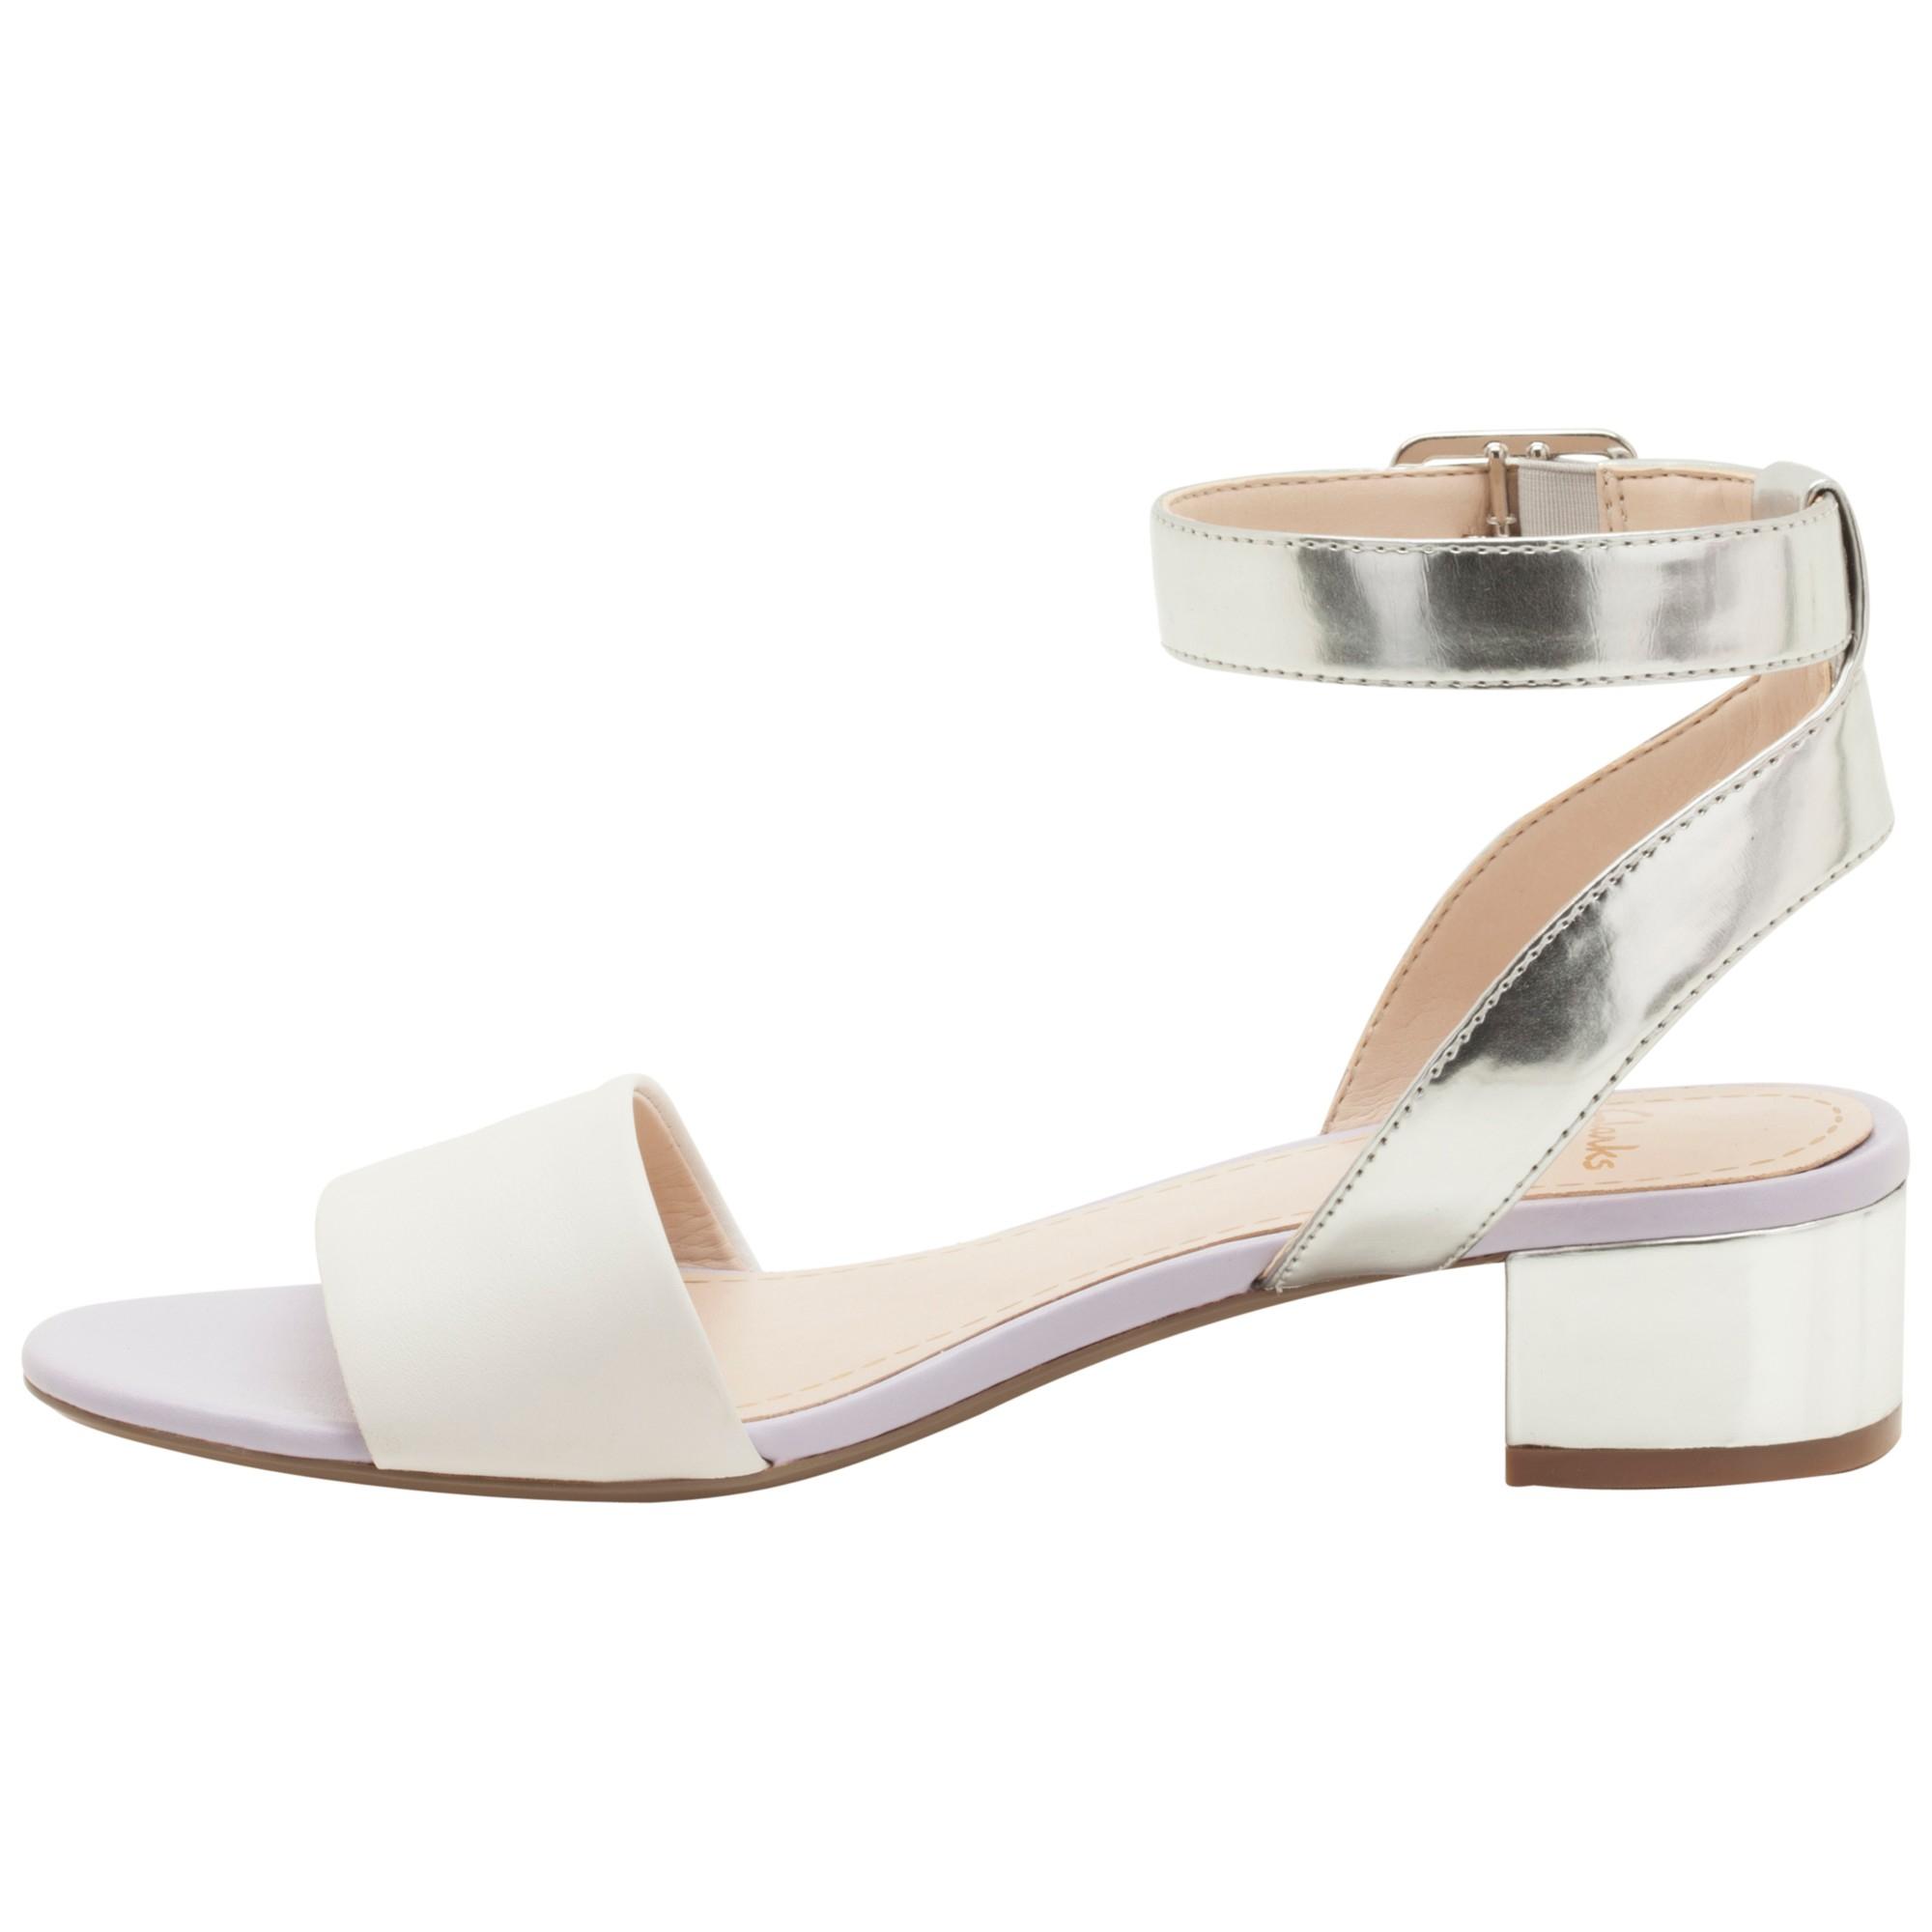 6d91d41d8b22 Clarks Sharna Balcony Sandals in White - Lyst